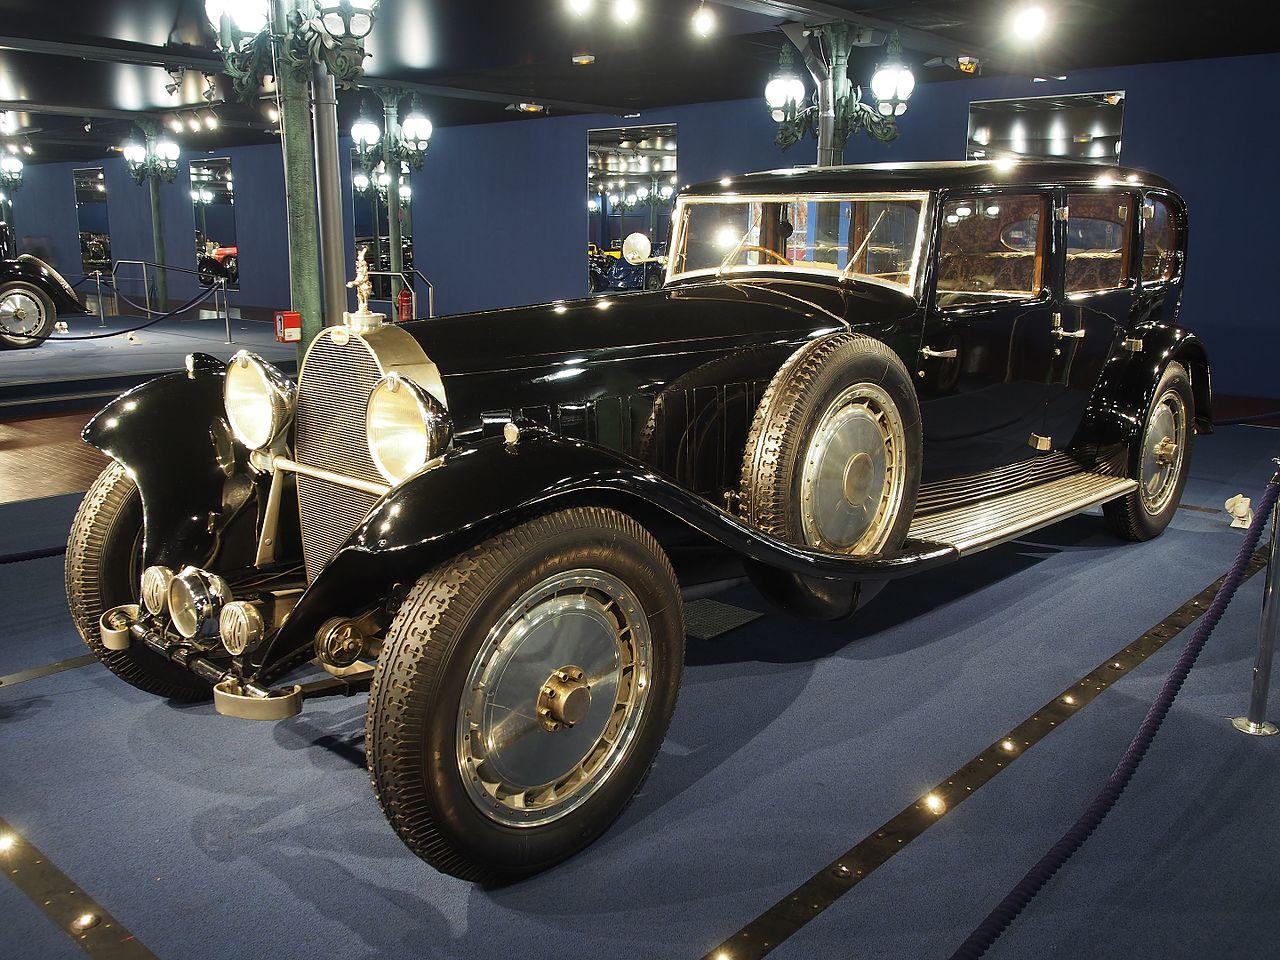 fichier 1933 bugatti limousine ttype 41 royale 300cv 12763cc 180kmh mna 0913 photo 1 jpg. Black Bedroom Furniture Sets. Home Design Ideas